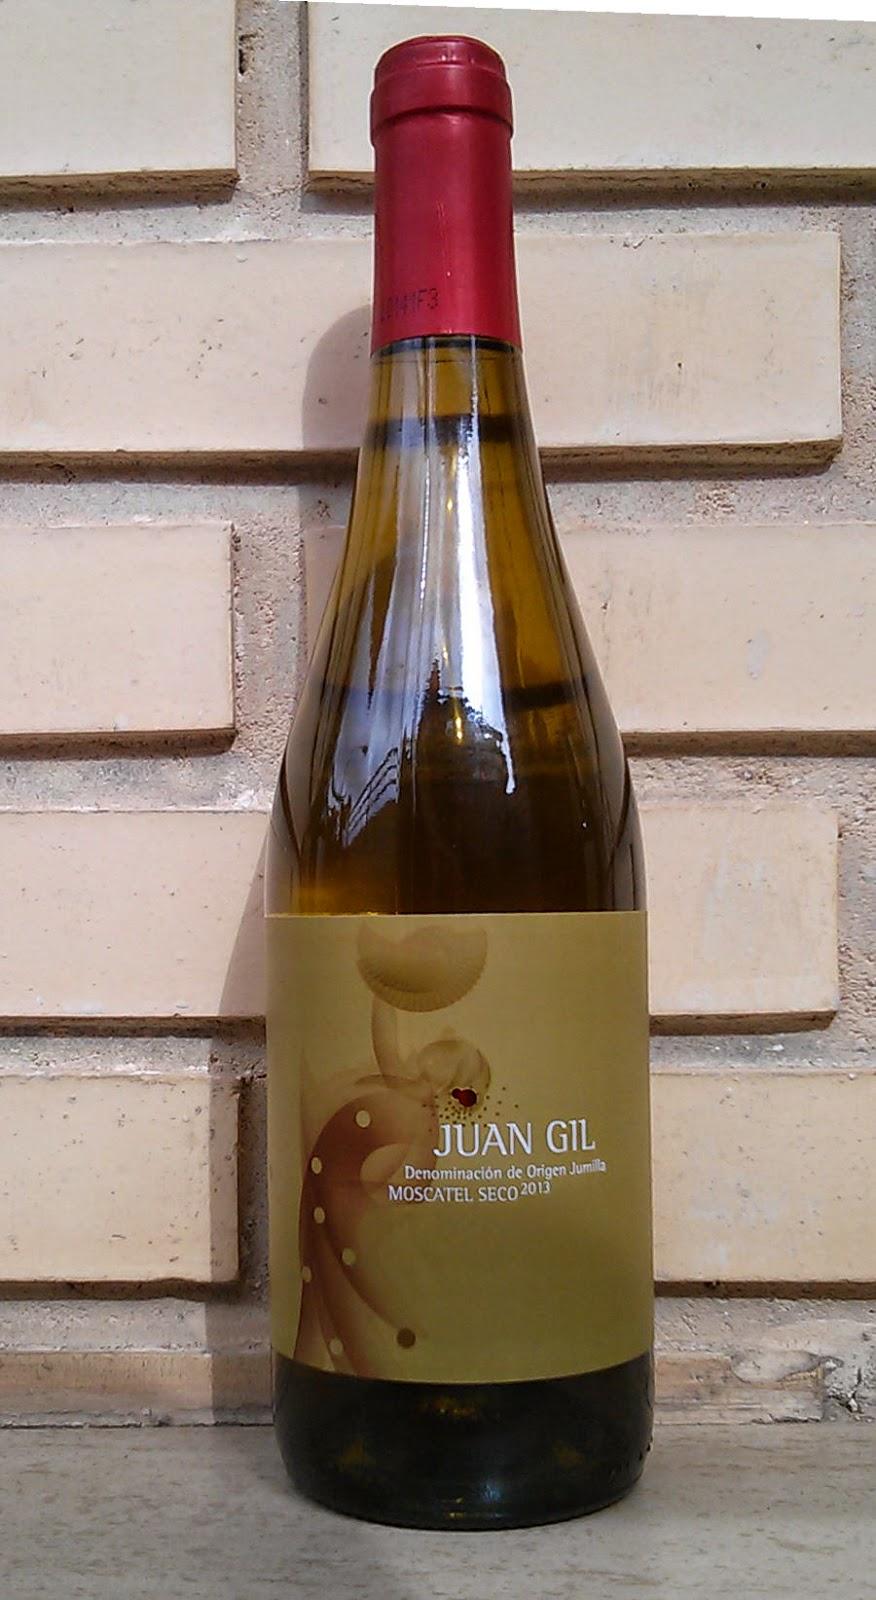 Juan Gil Moscatel